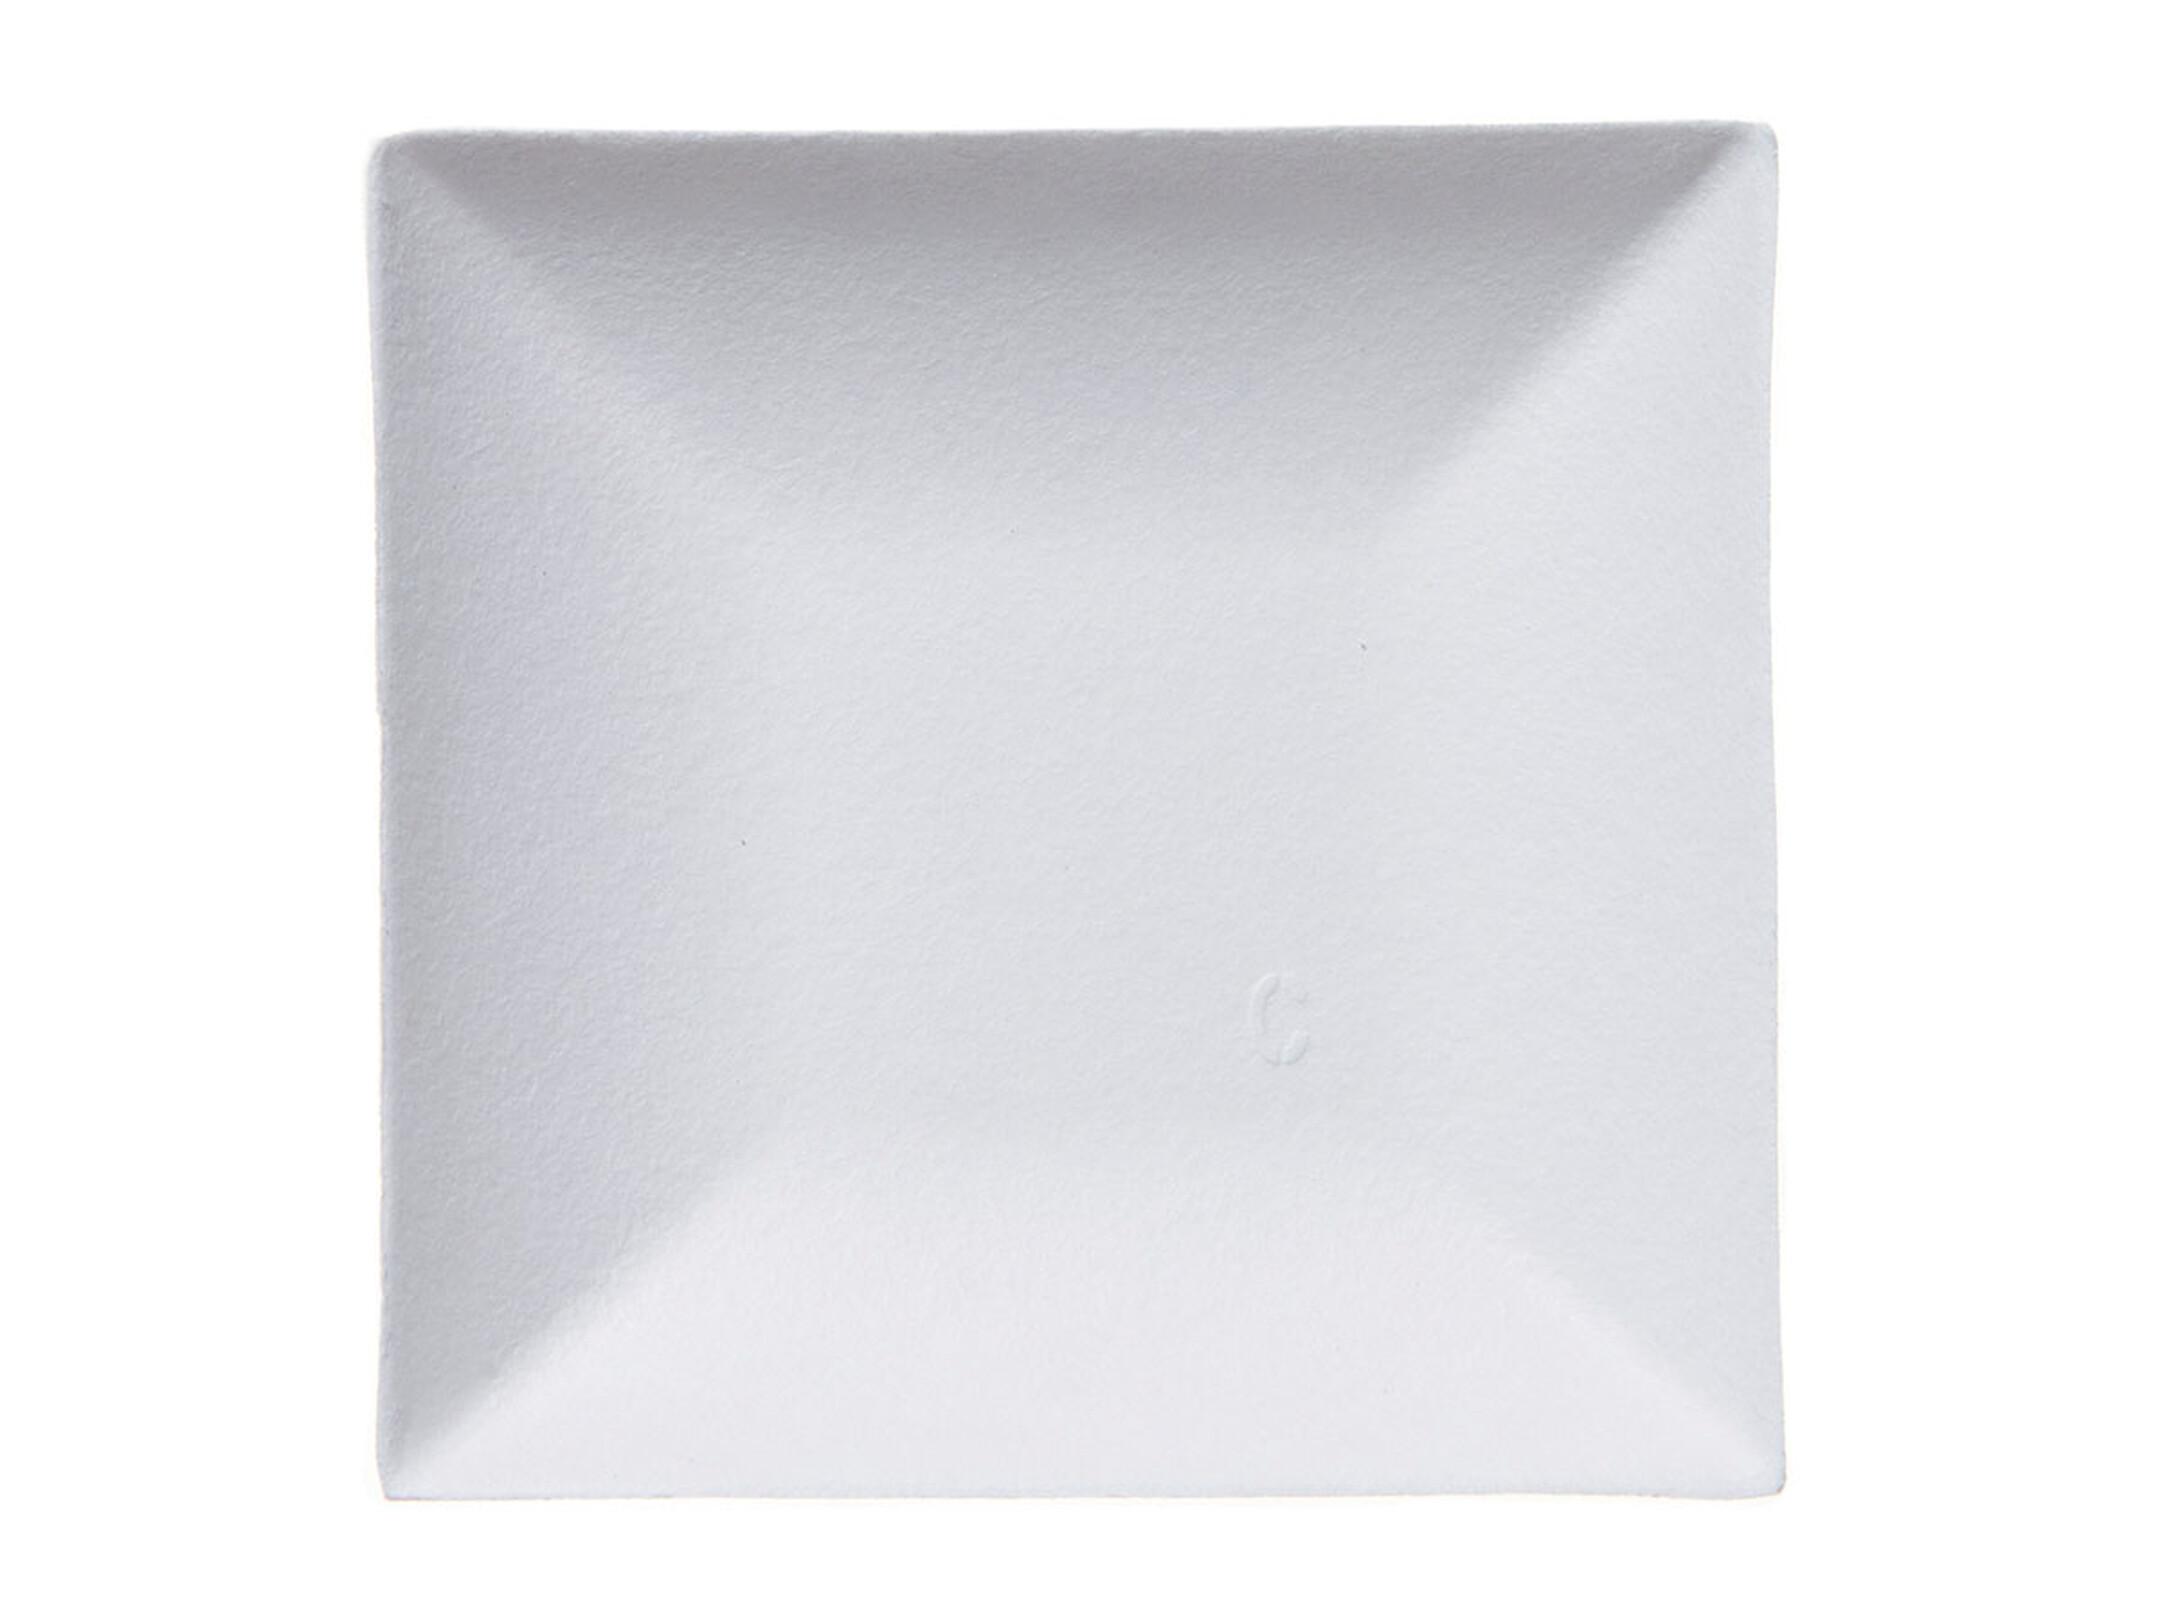 Teller Pappteller Einwegteller Pappe eckig 26 cm x 26 cm